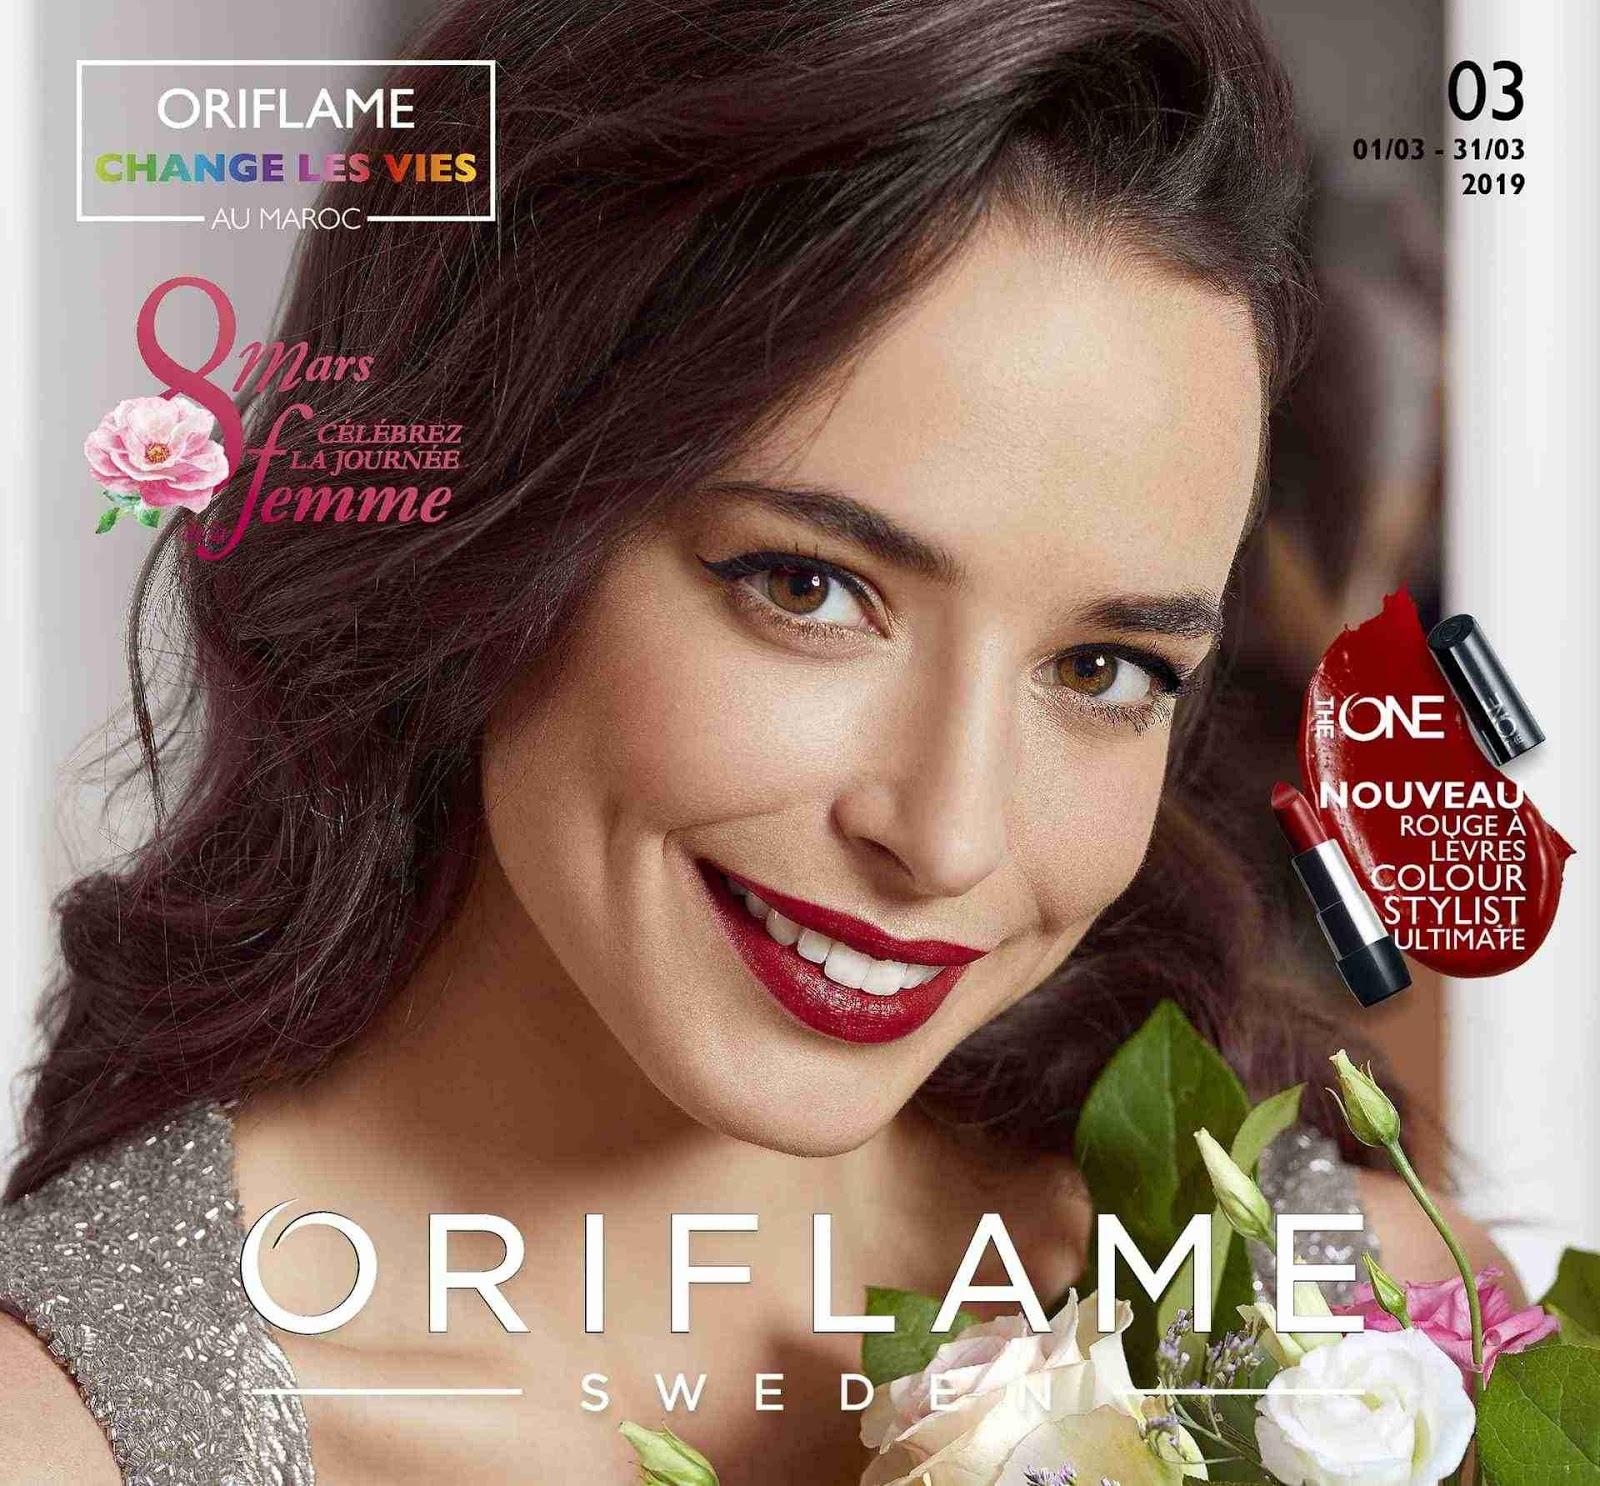 Catalogue Oriflame Maroc Mars 2019 Lecatalogue 100 Catalogues